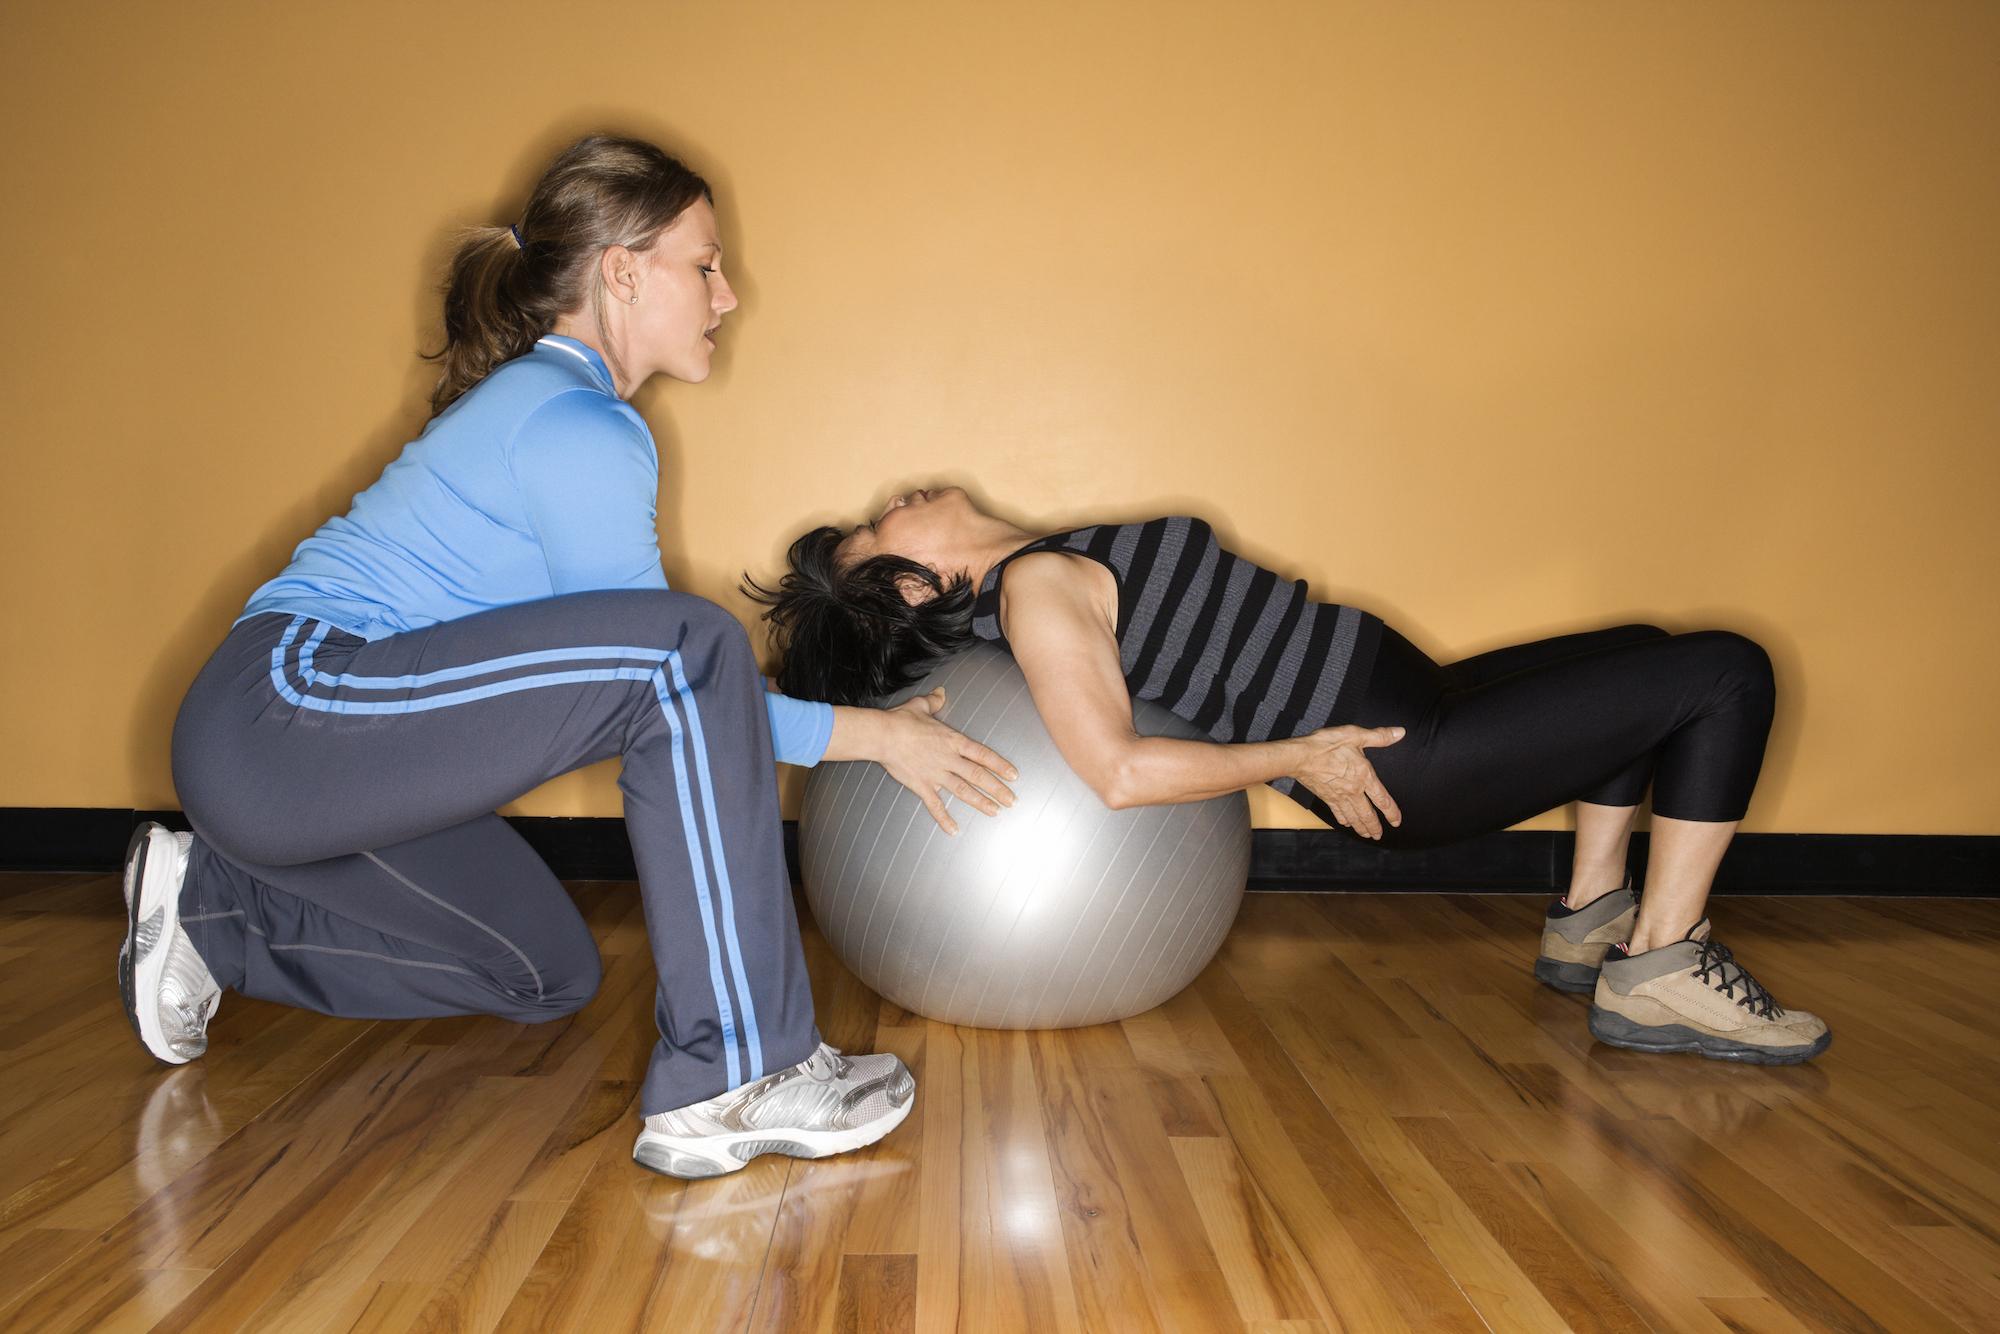 senior woman doing squats on exercise ball